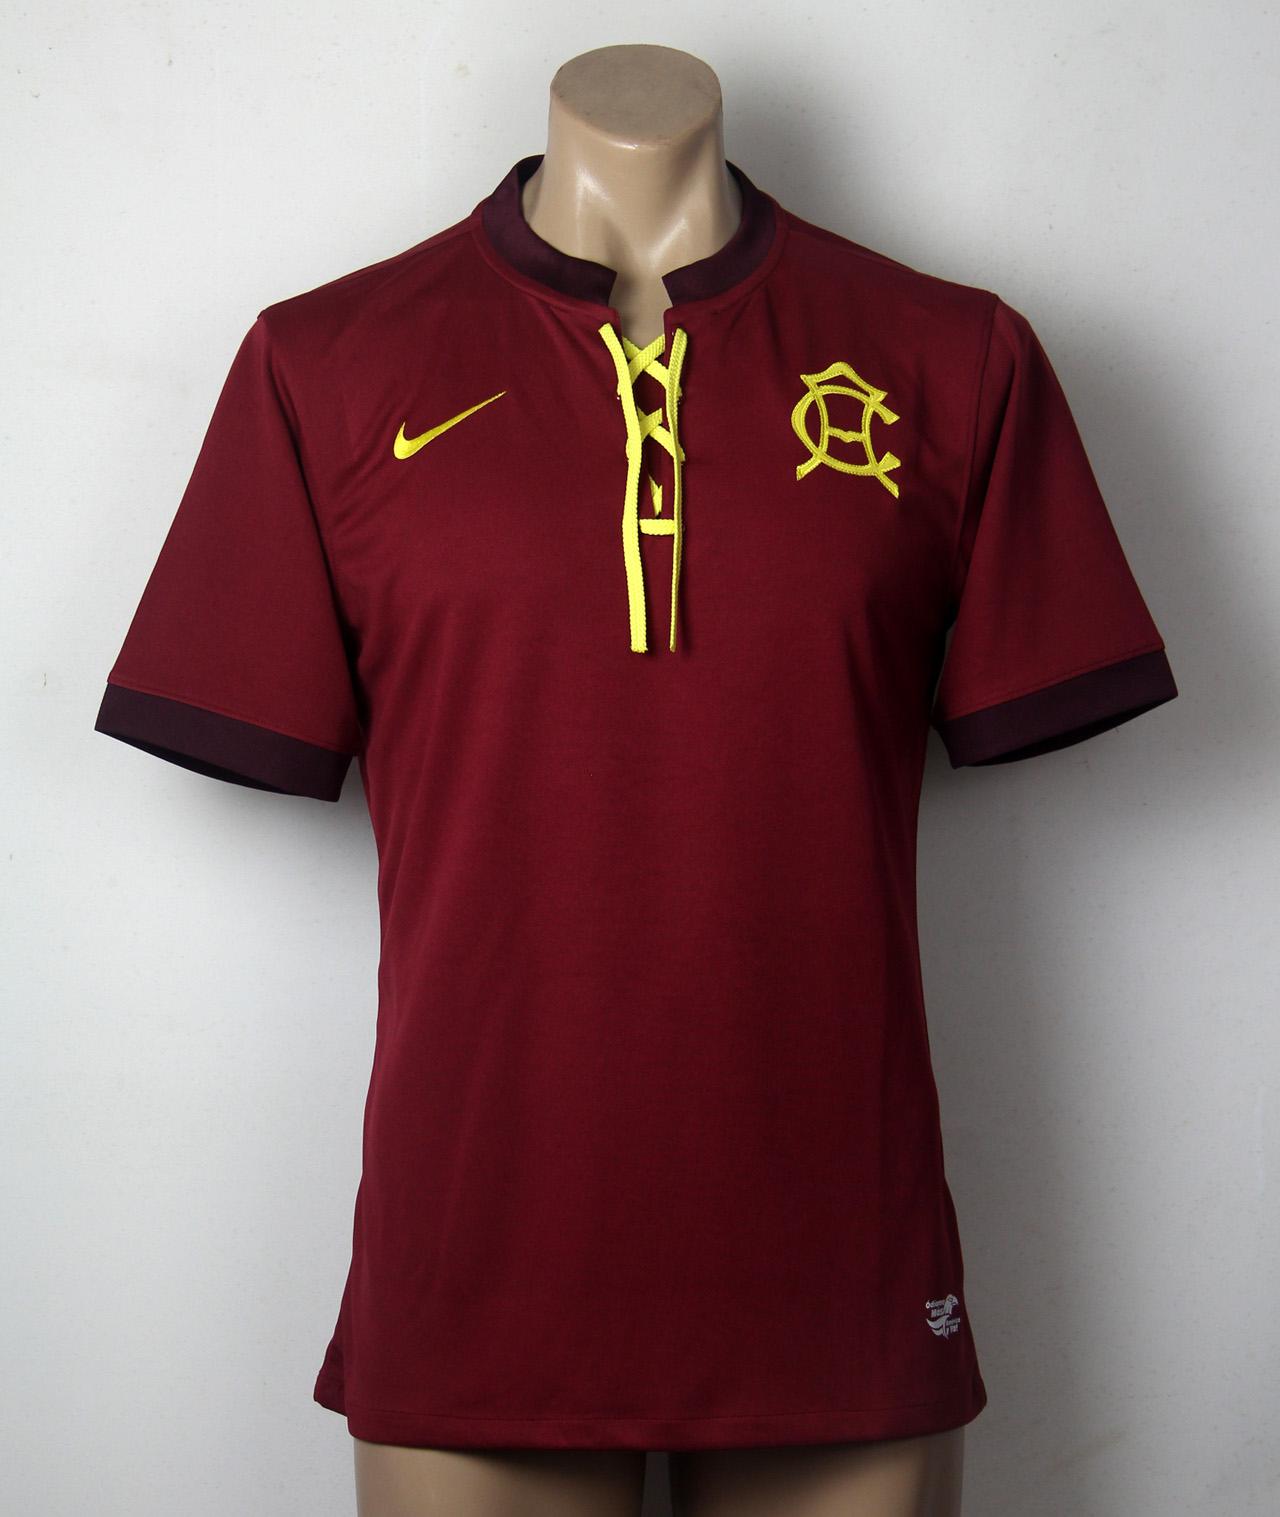 buy popular 36aca 30de6 Club America : GoGoalShop, Buy Cheap Soccer Jersey & Replica ...